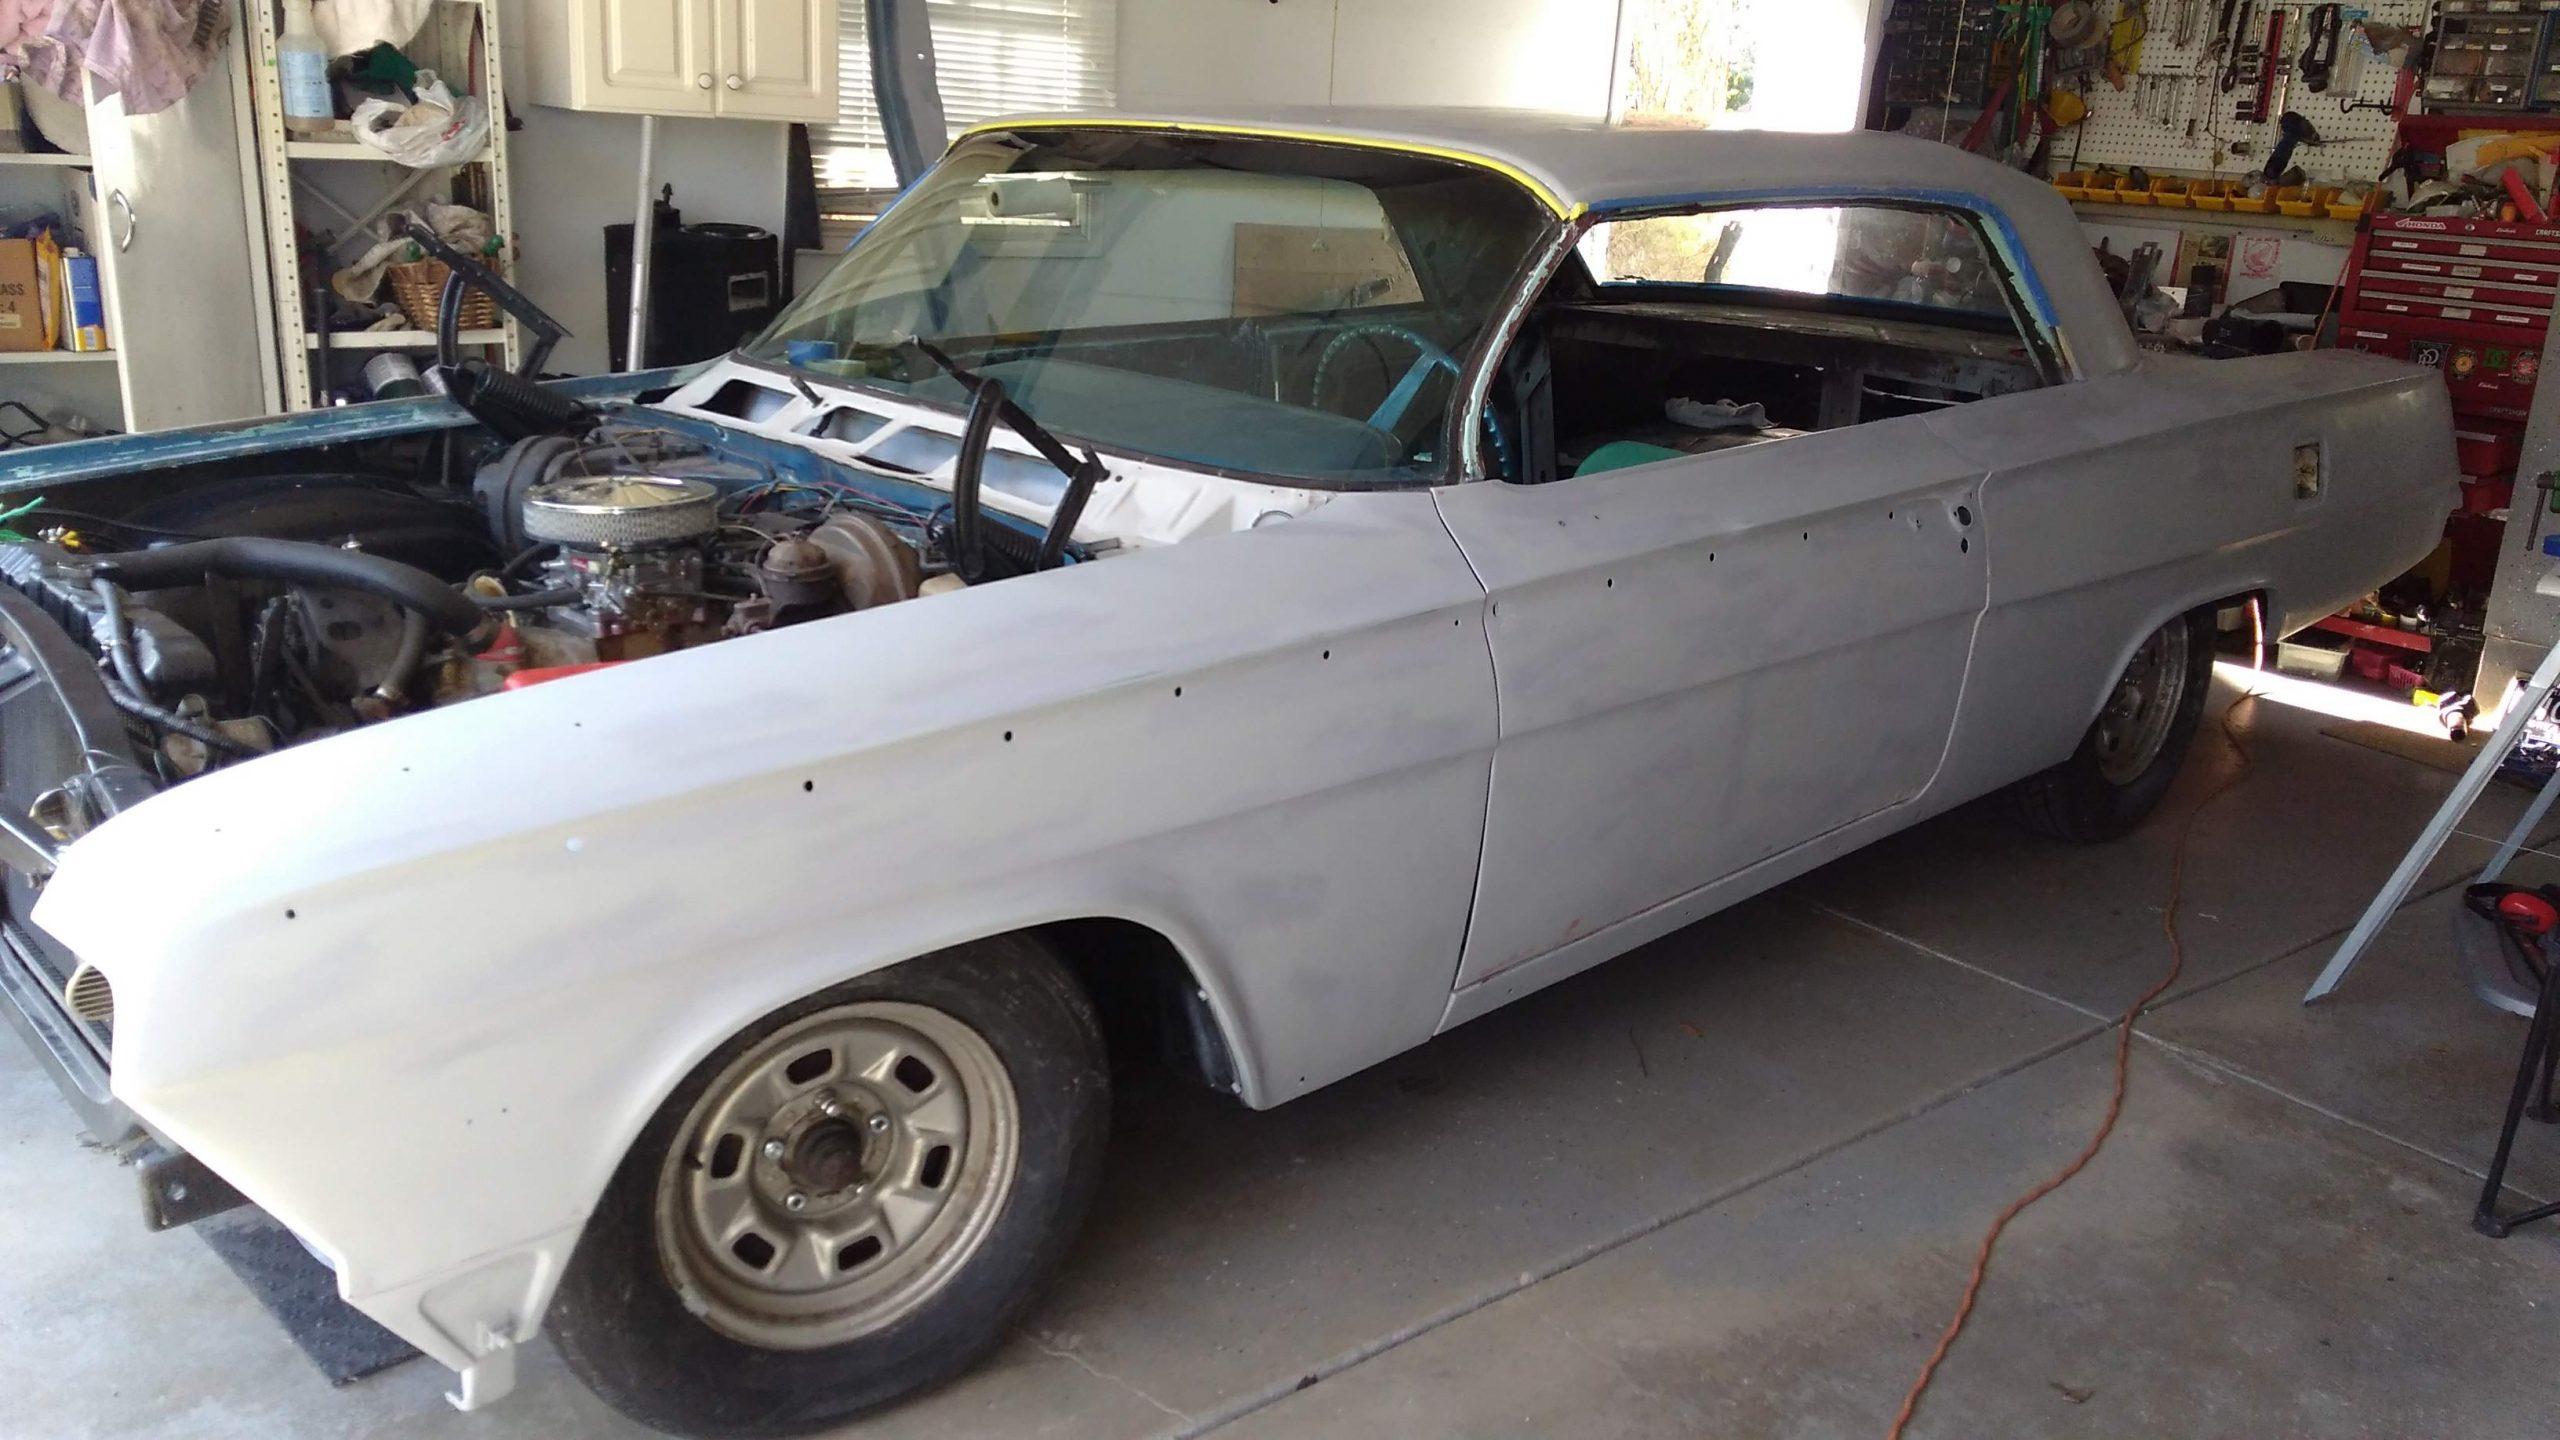 Jason Prince - 1962 Chevrolet Impala - Primed